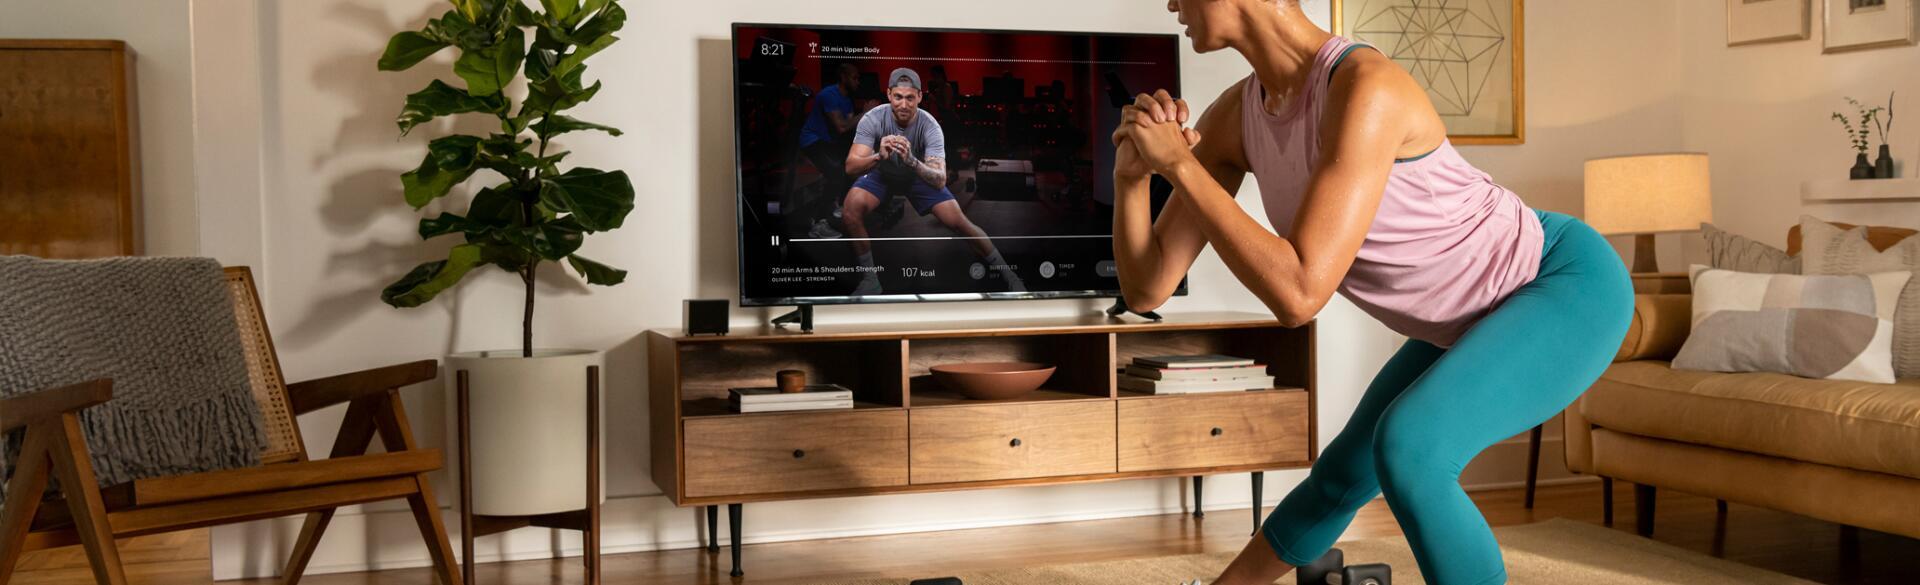 At_home_workouts_Peloton-Digital-Lifestyle-02_1540.jpg